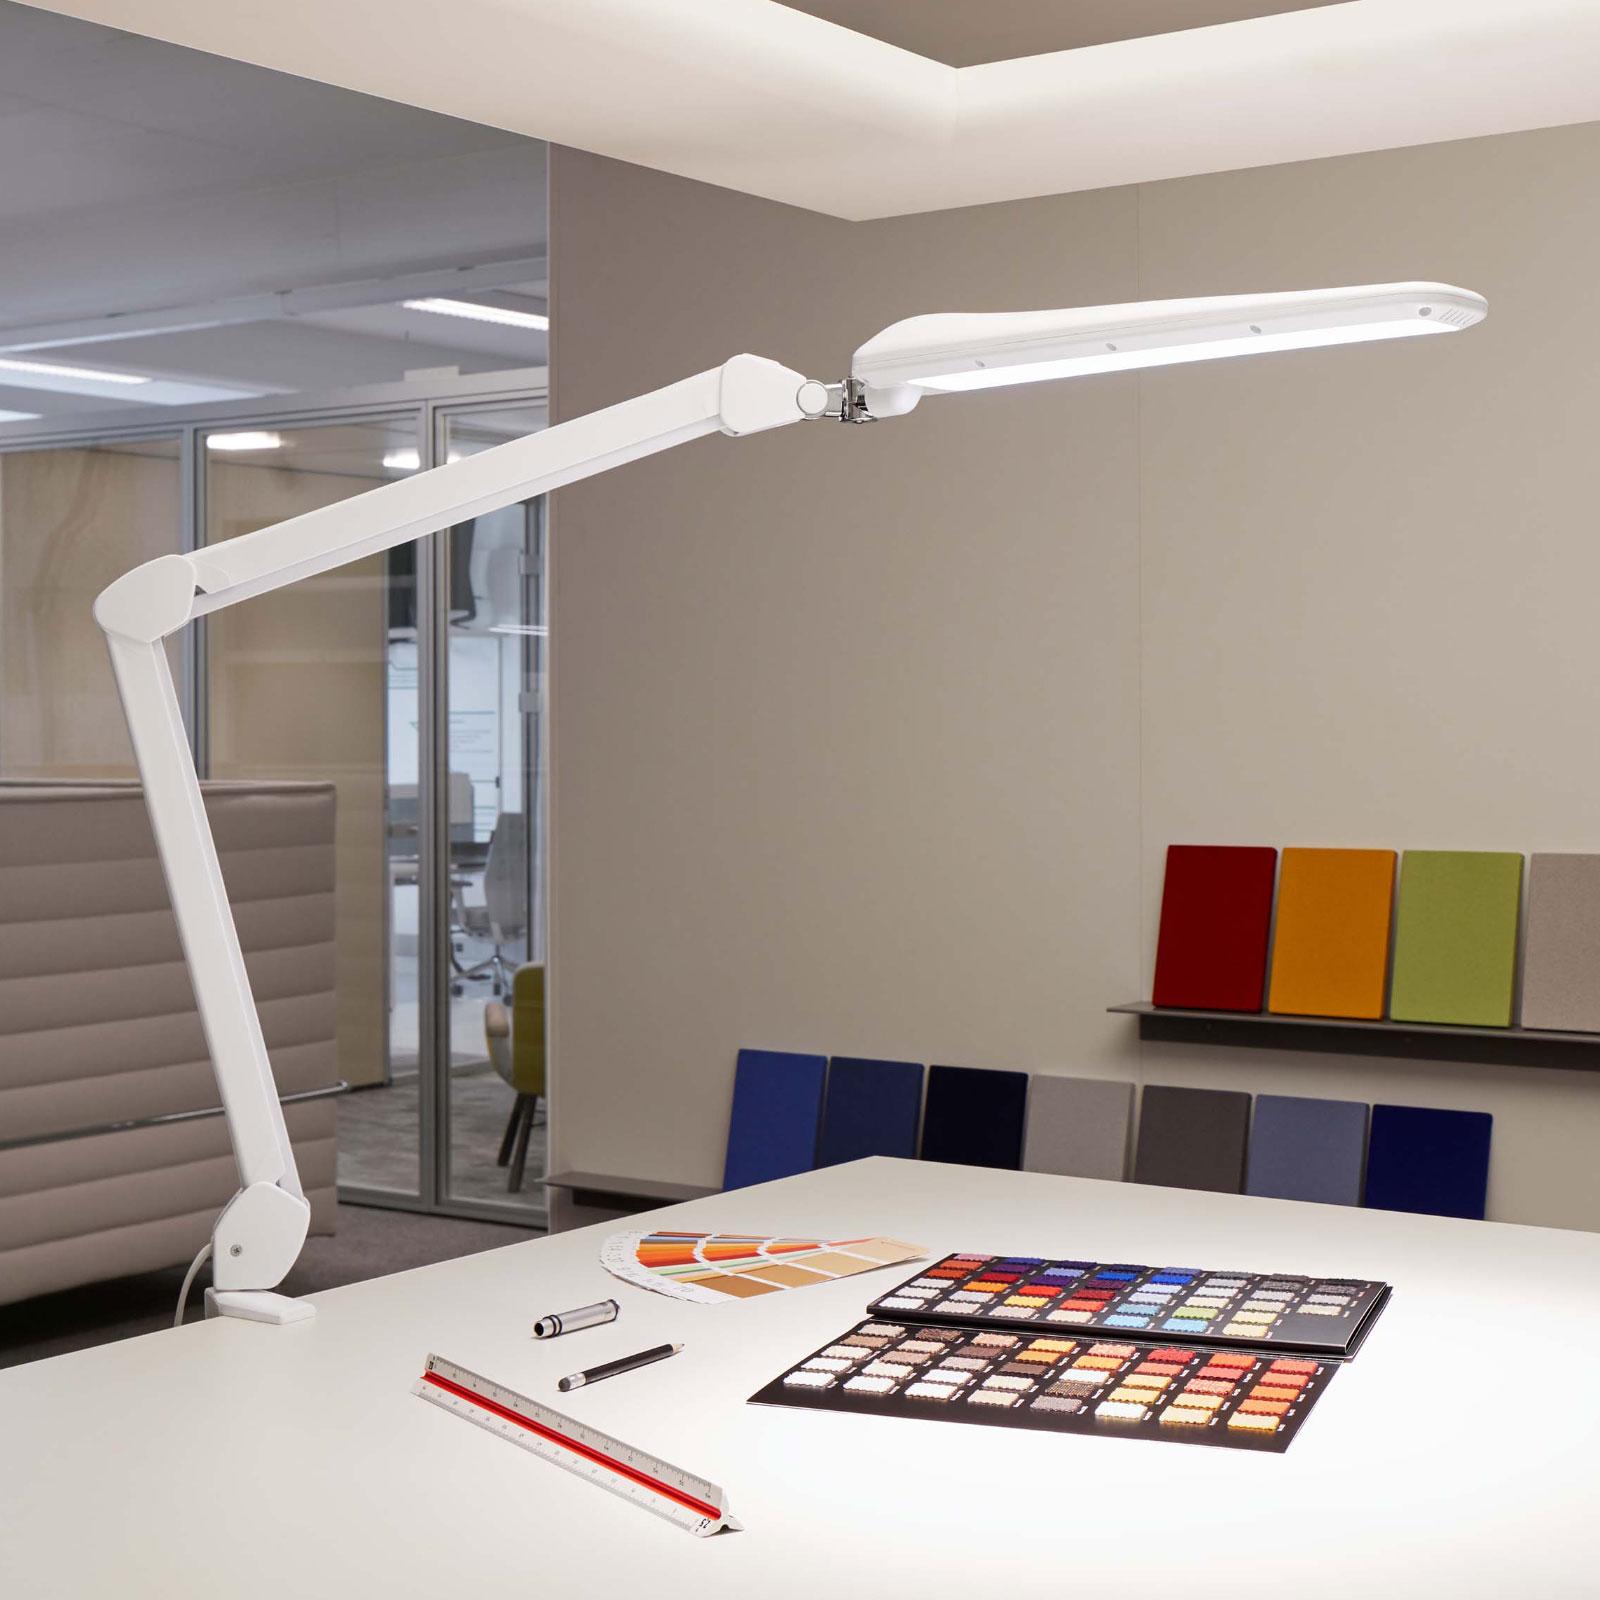 LED tafellamp MAULcraft met klemvoet, dimbaar